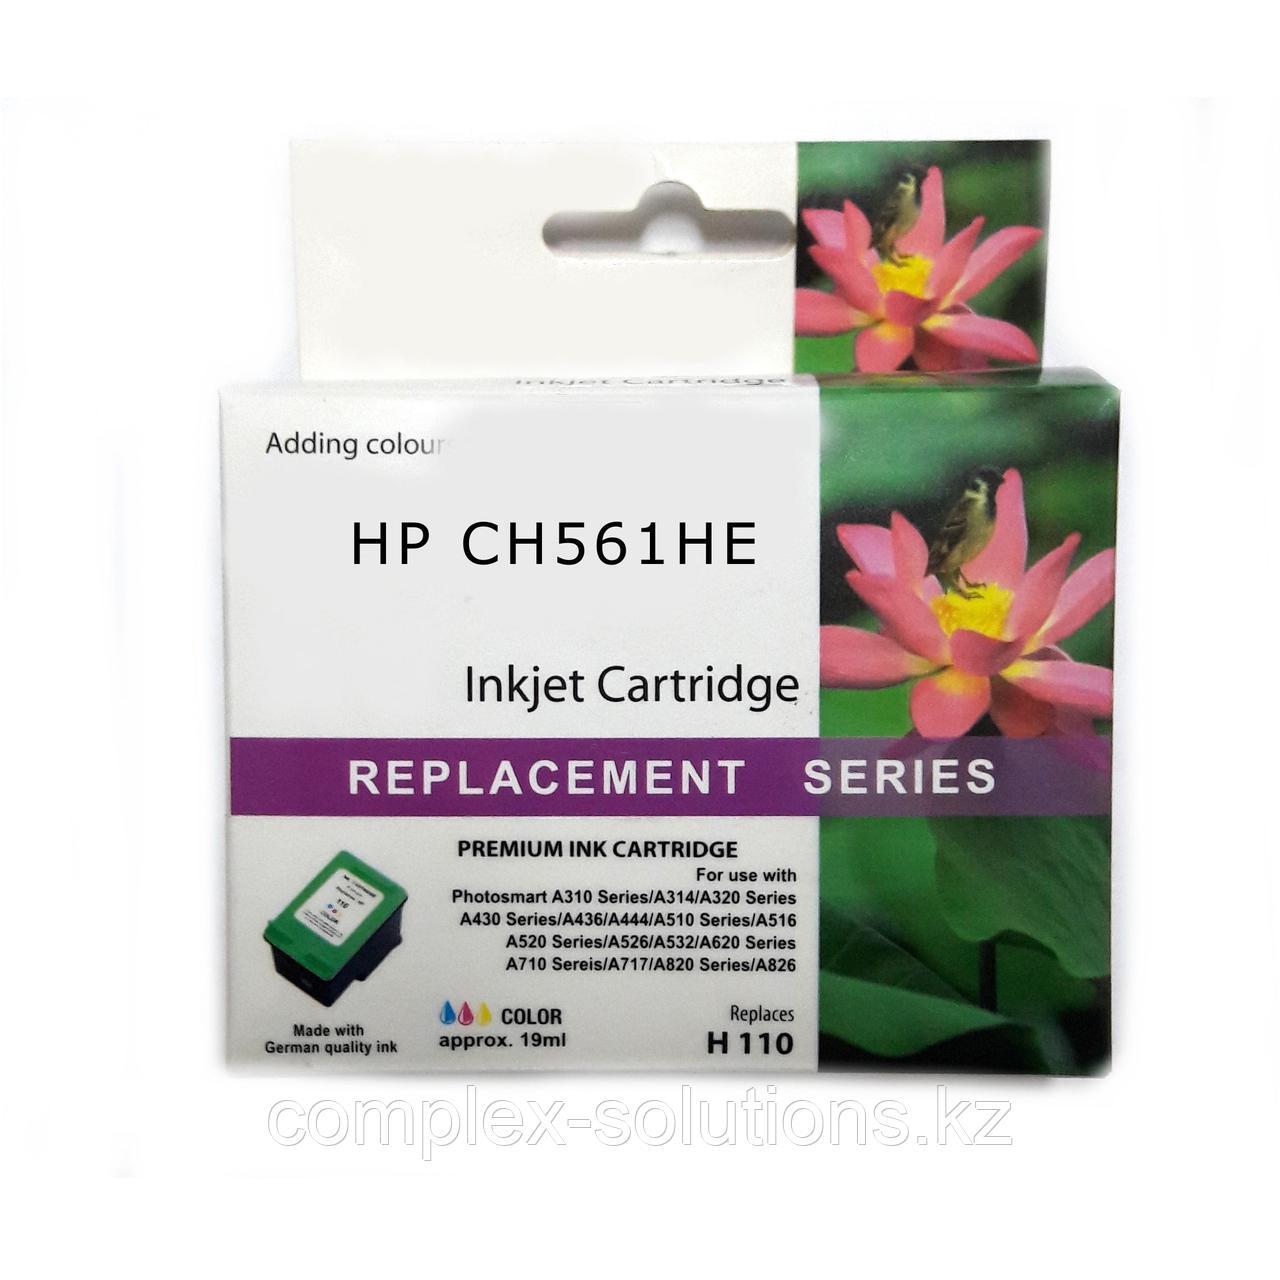 Картридж HP CH561HE Black №122 JET TEK | [качественный дубликат]